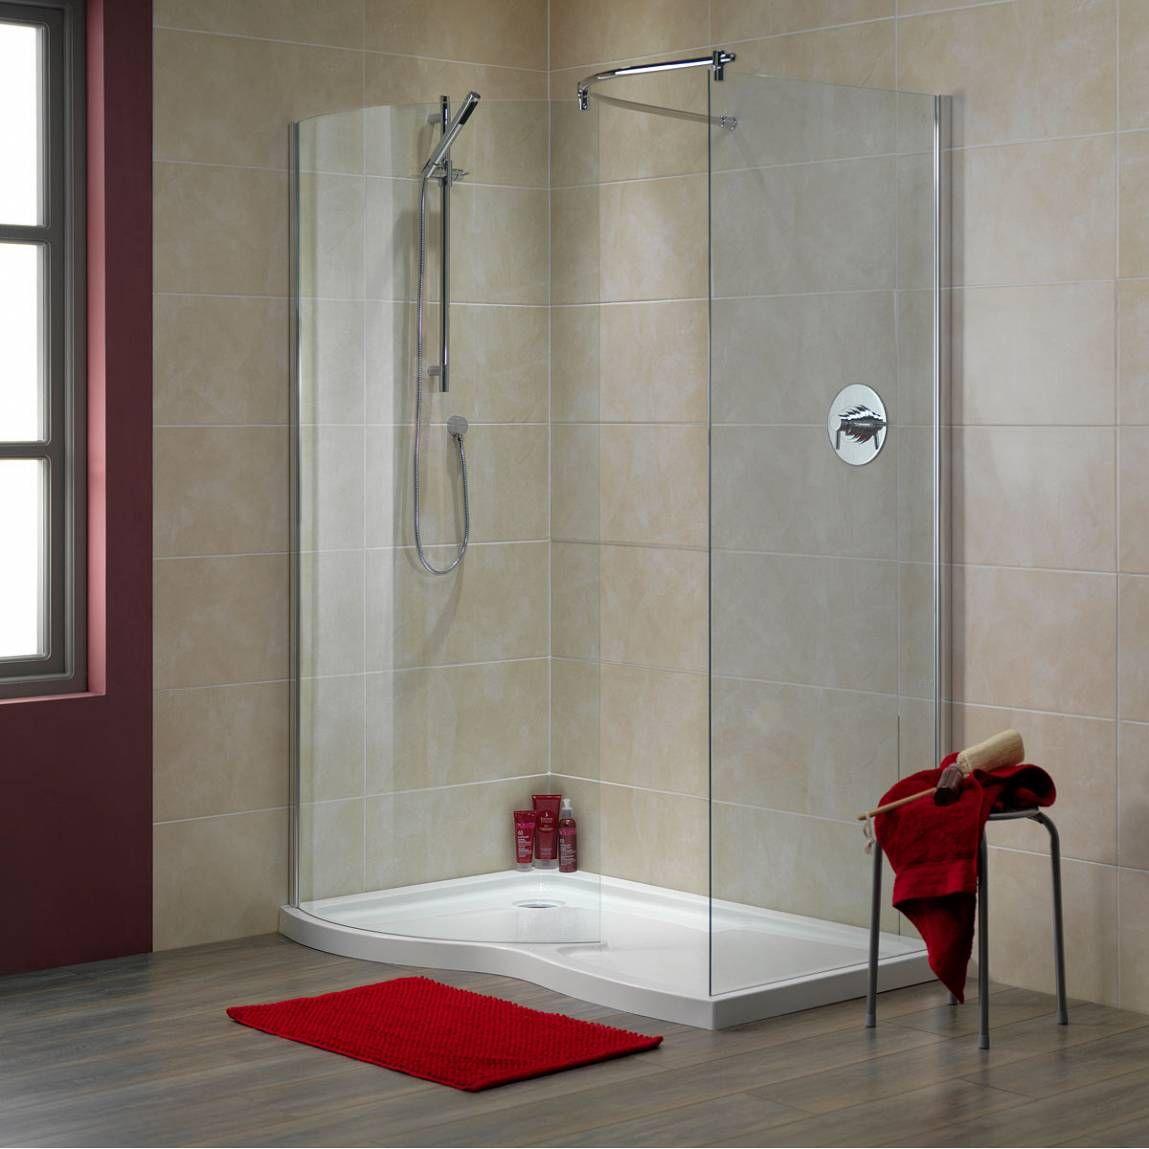 Comvictoria Plumb Bathrooms : Pin by Victoria Plumb on Victoria Plumb & Hillarys - Bathroom Inspira ...